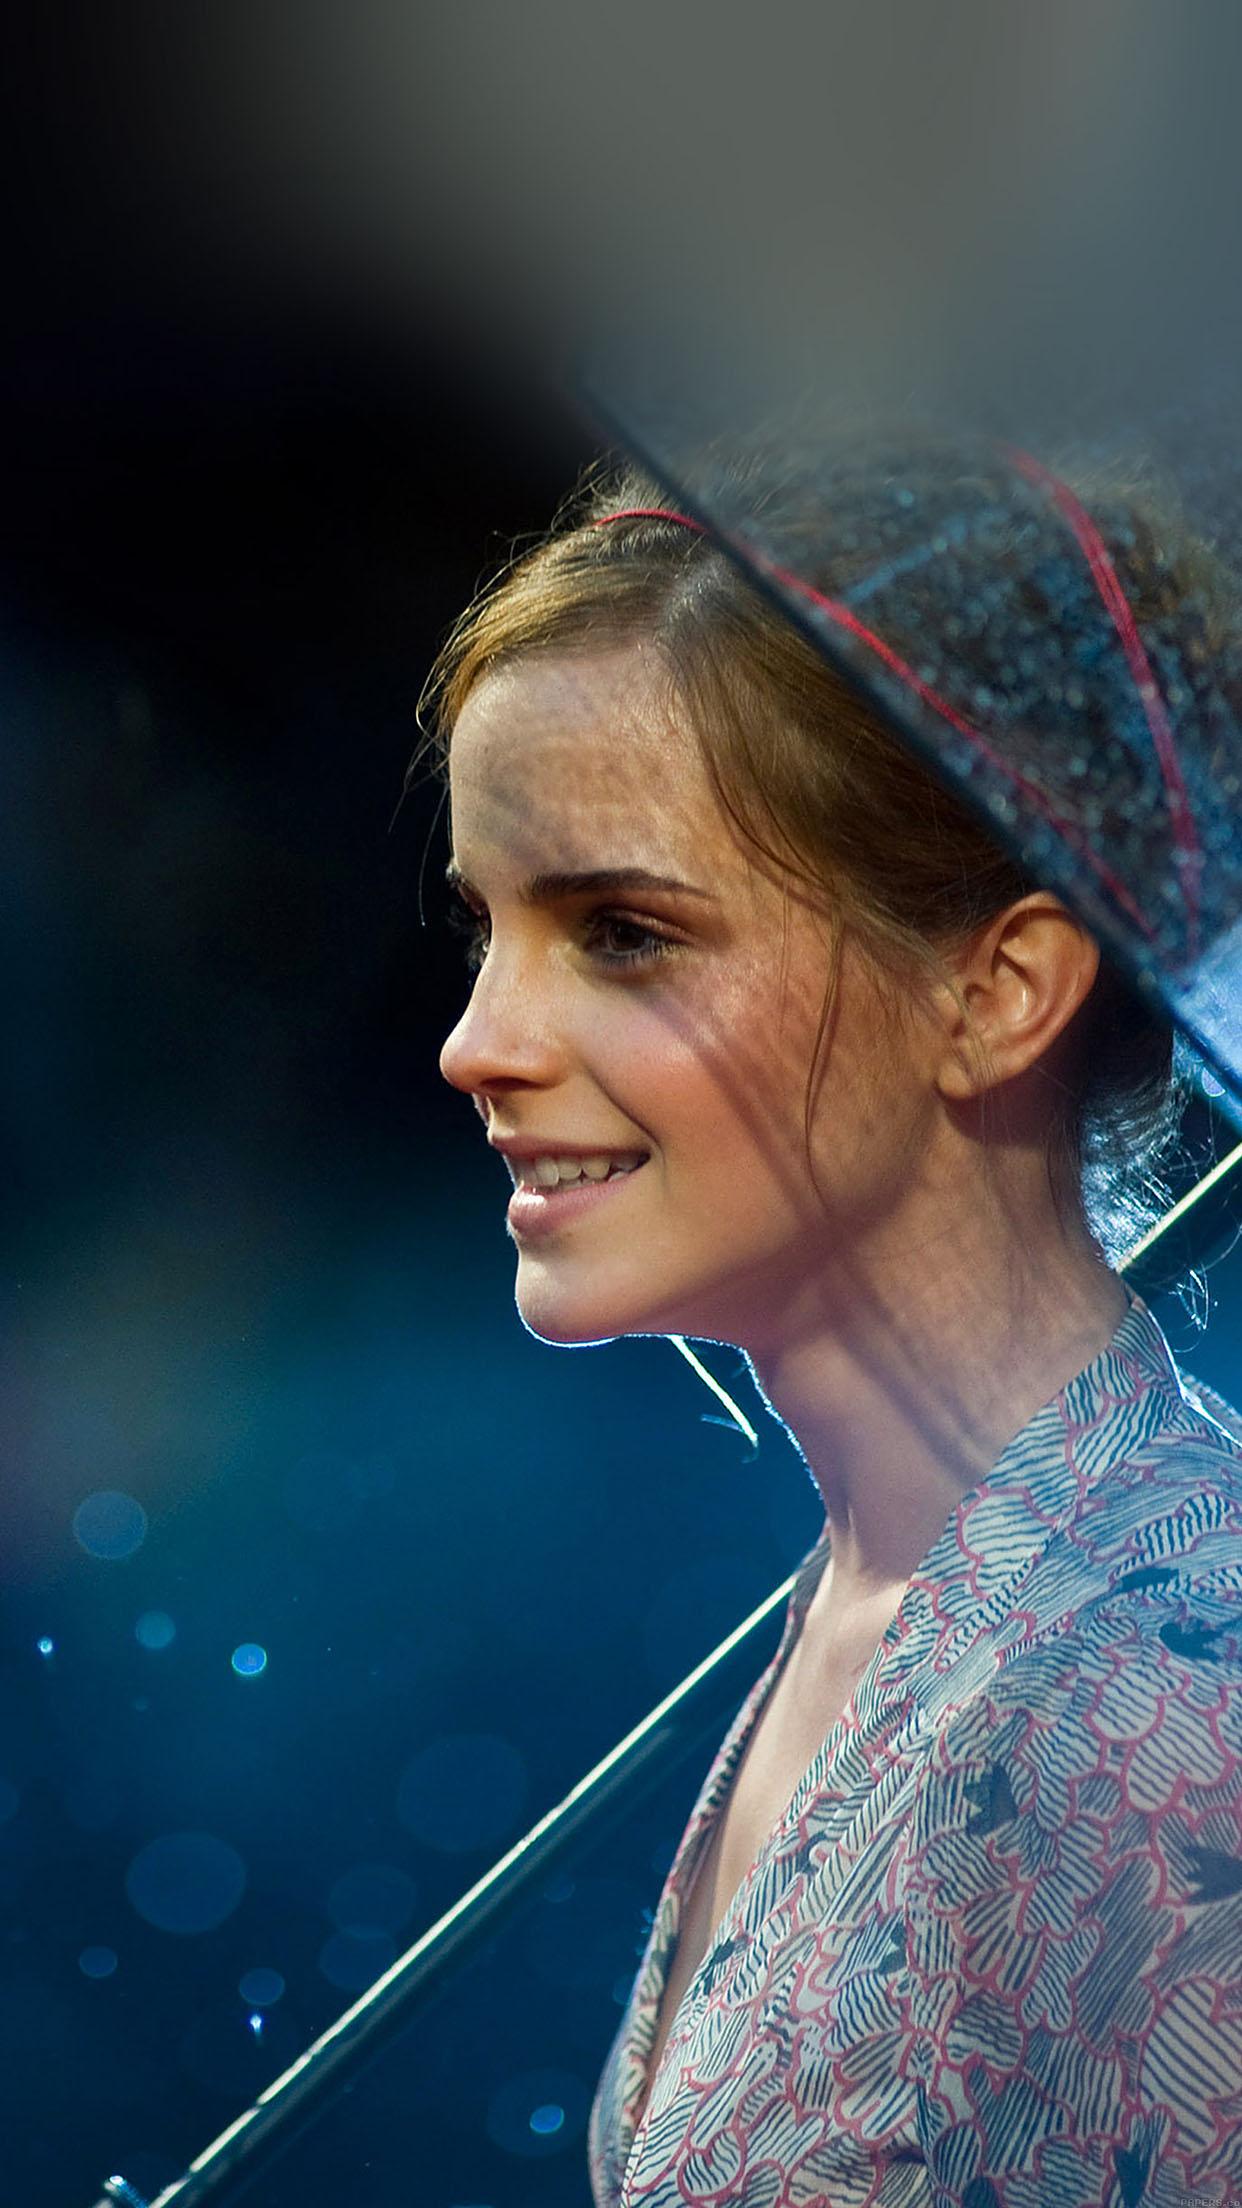 Iphone 6 Plus - Emma Watson Wallpaper Hd Iphone , HD Wallpaper & Backgrounds